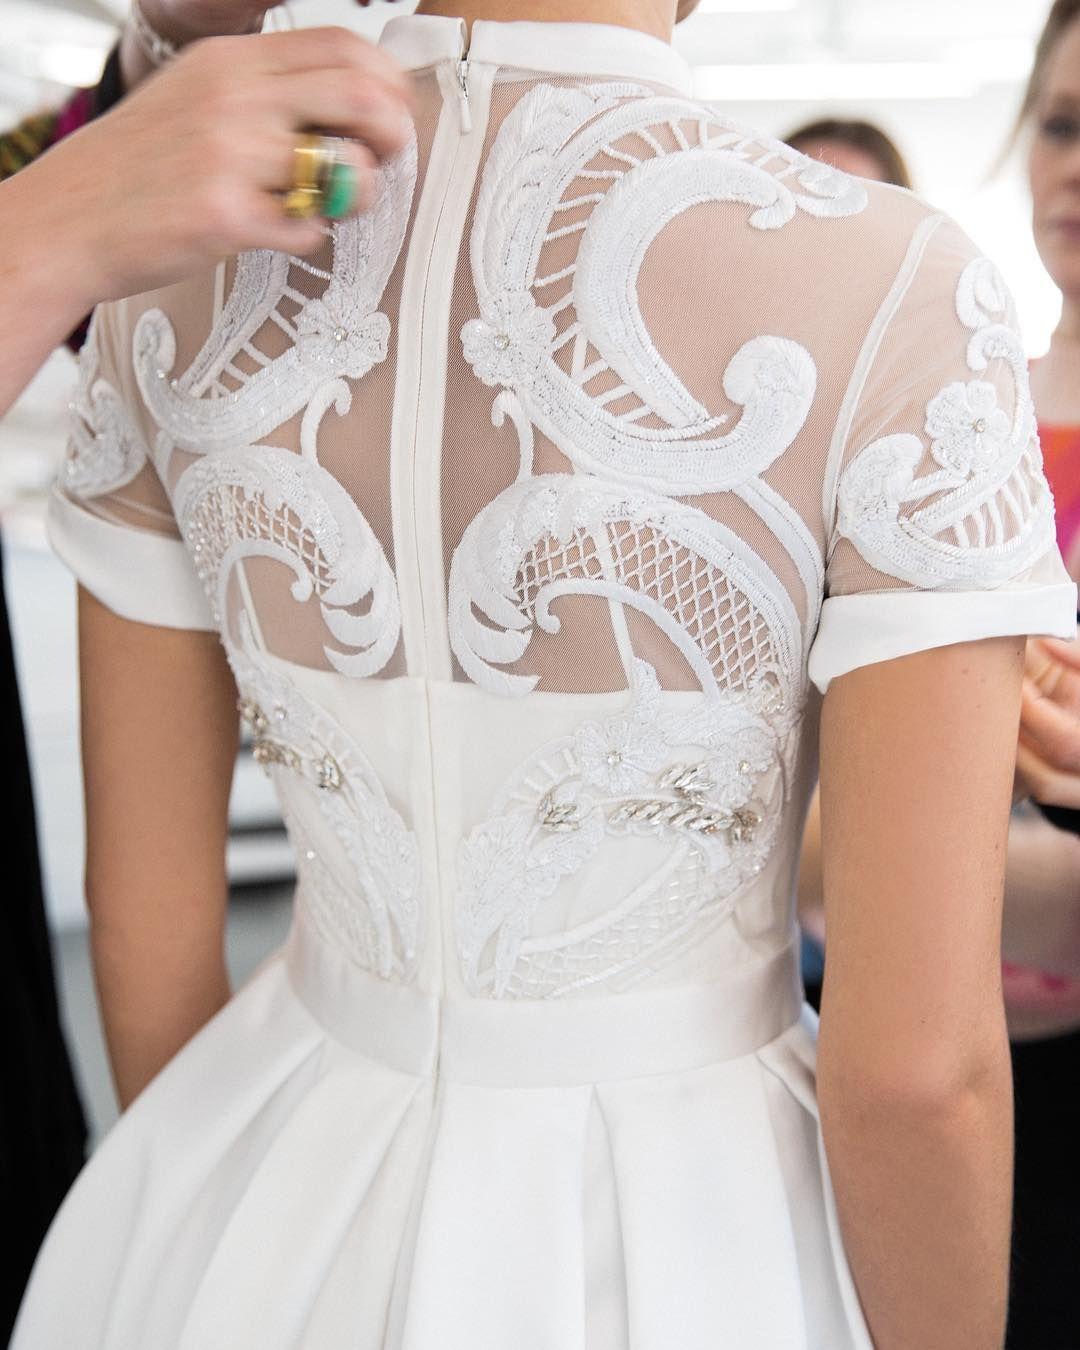 Pin by melinda robinson on weddings pinterest temperley bridal